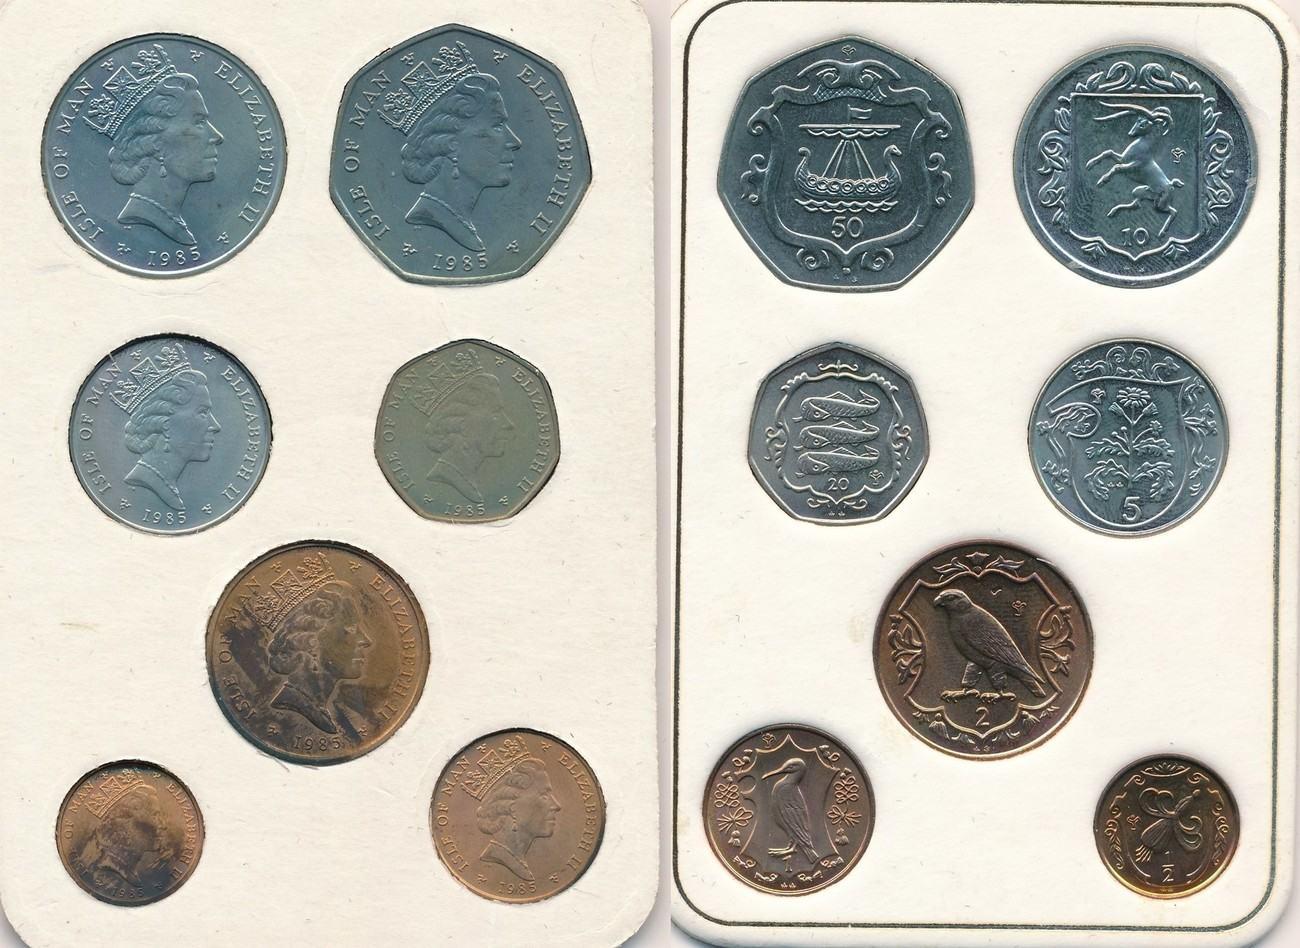 Münzsatz 1985 Isle Of Man 7 Münzen 50 20 10 5 2 Pence 1 Penny